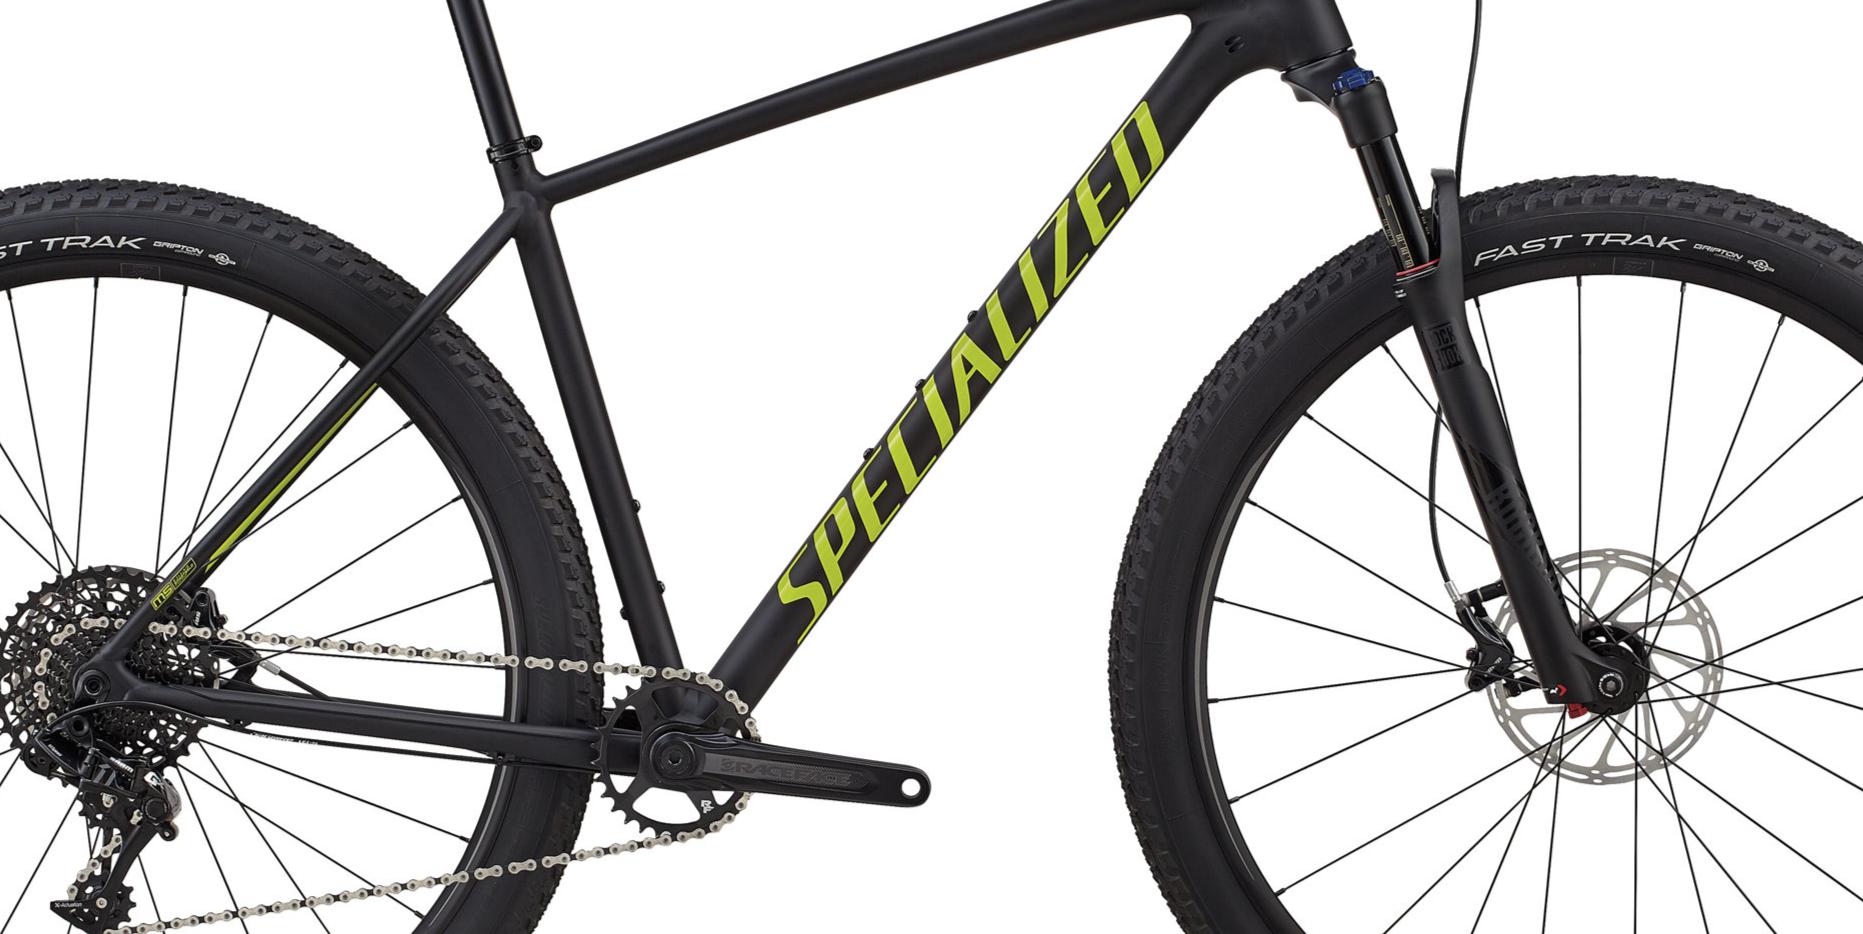 7cfeec62324 Bike details. Marketplace | specialized Men's Chisel Expert - 1x